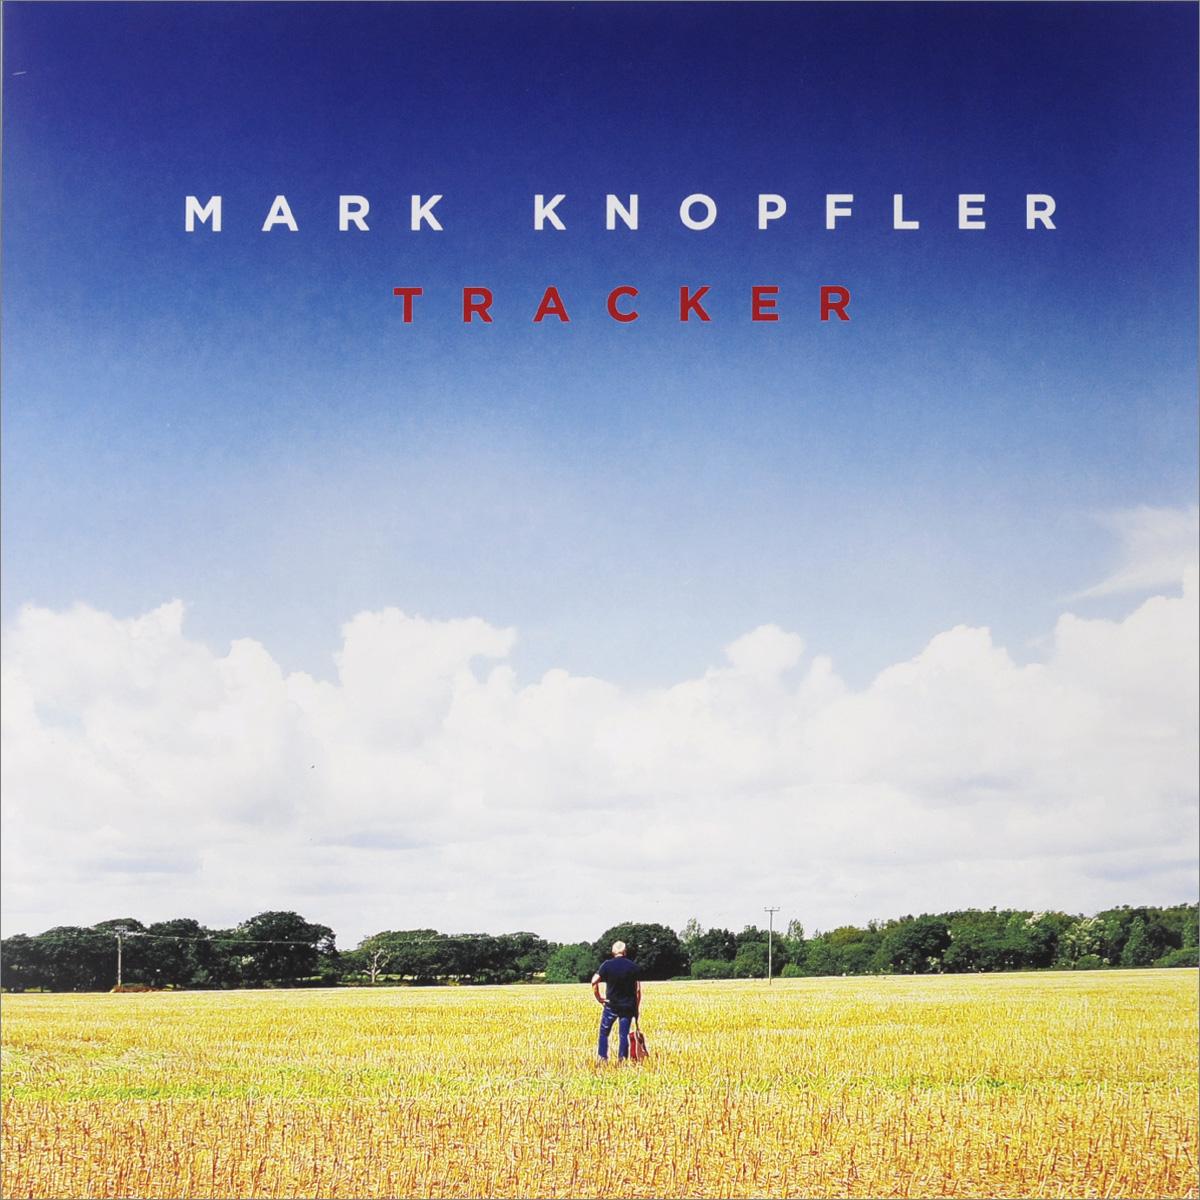 Марк Нопфлер Mark Knopfler. Tracker (2 LP) asus z270 mark 2